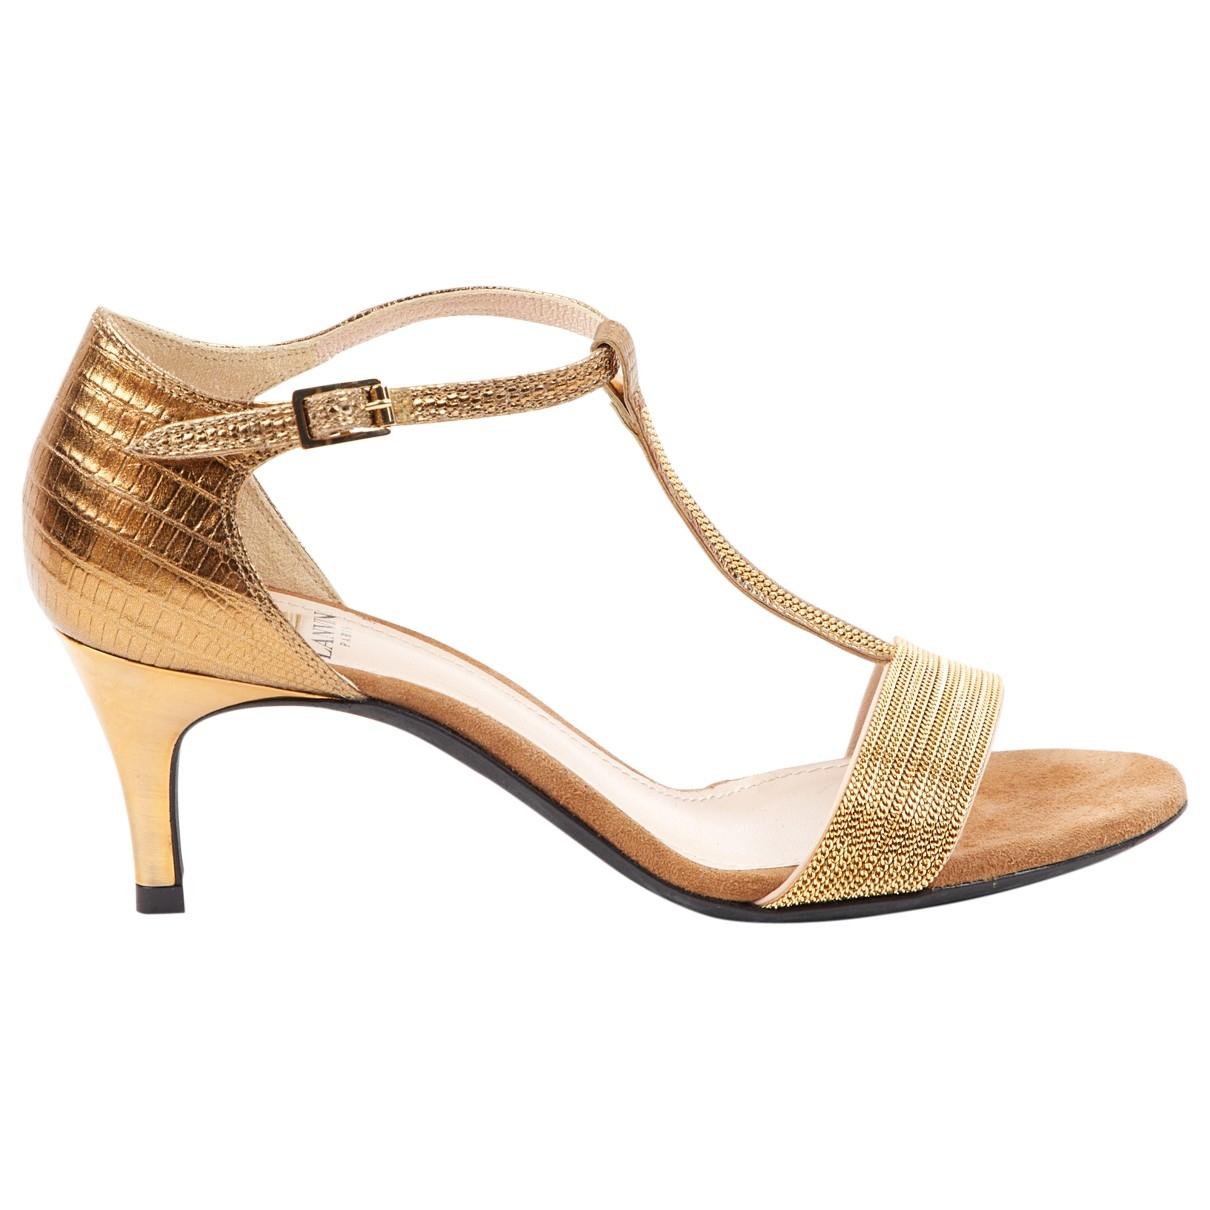 Lanvin \N Gold Leather Heels for Women 37 EU